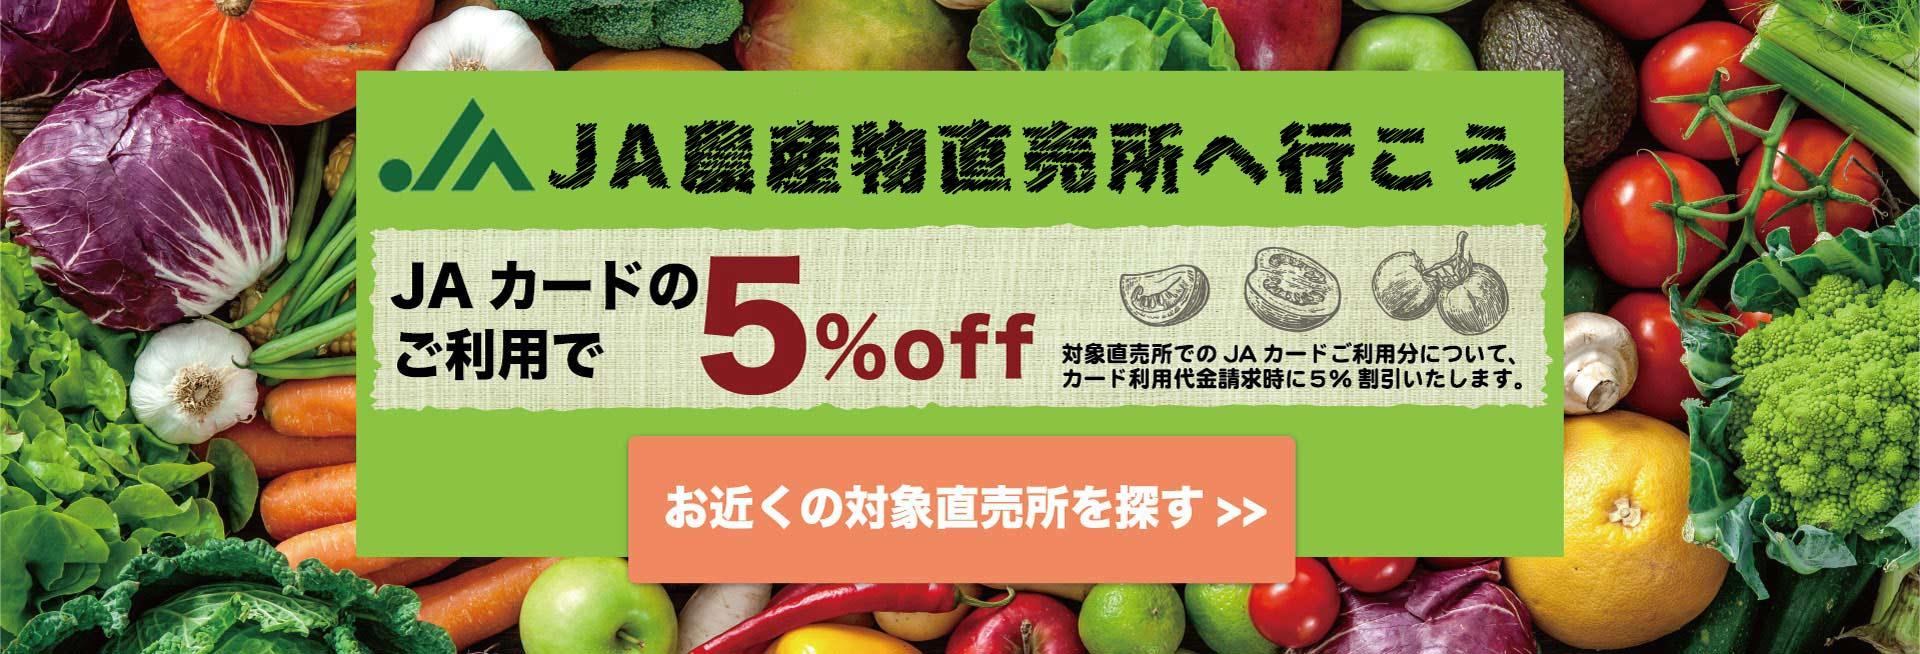 JA農産物直売所へ行こう JAカードのご利用で5%off